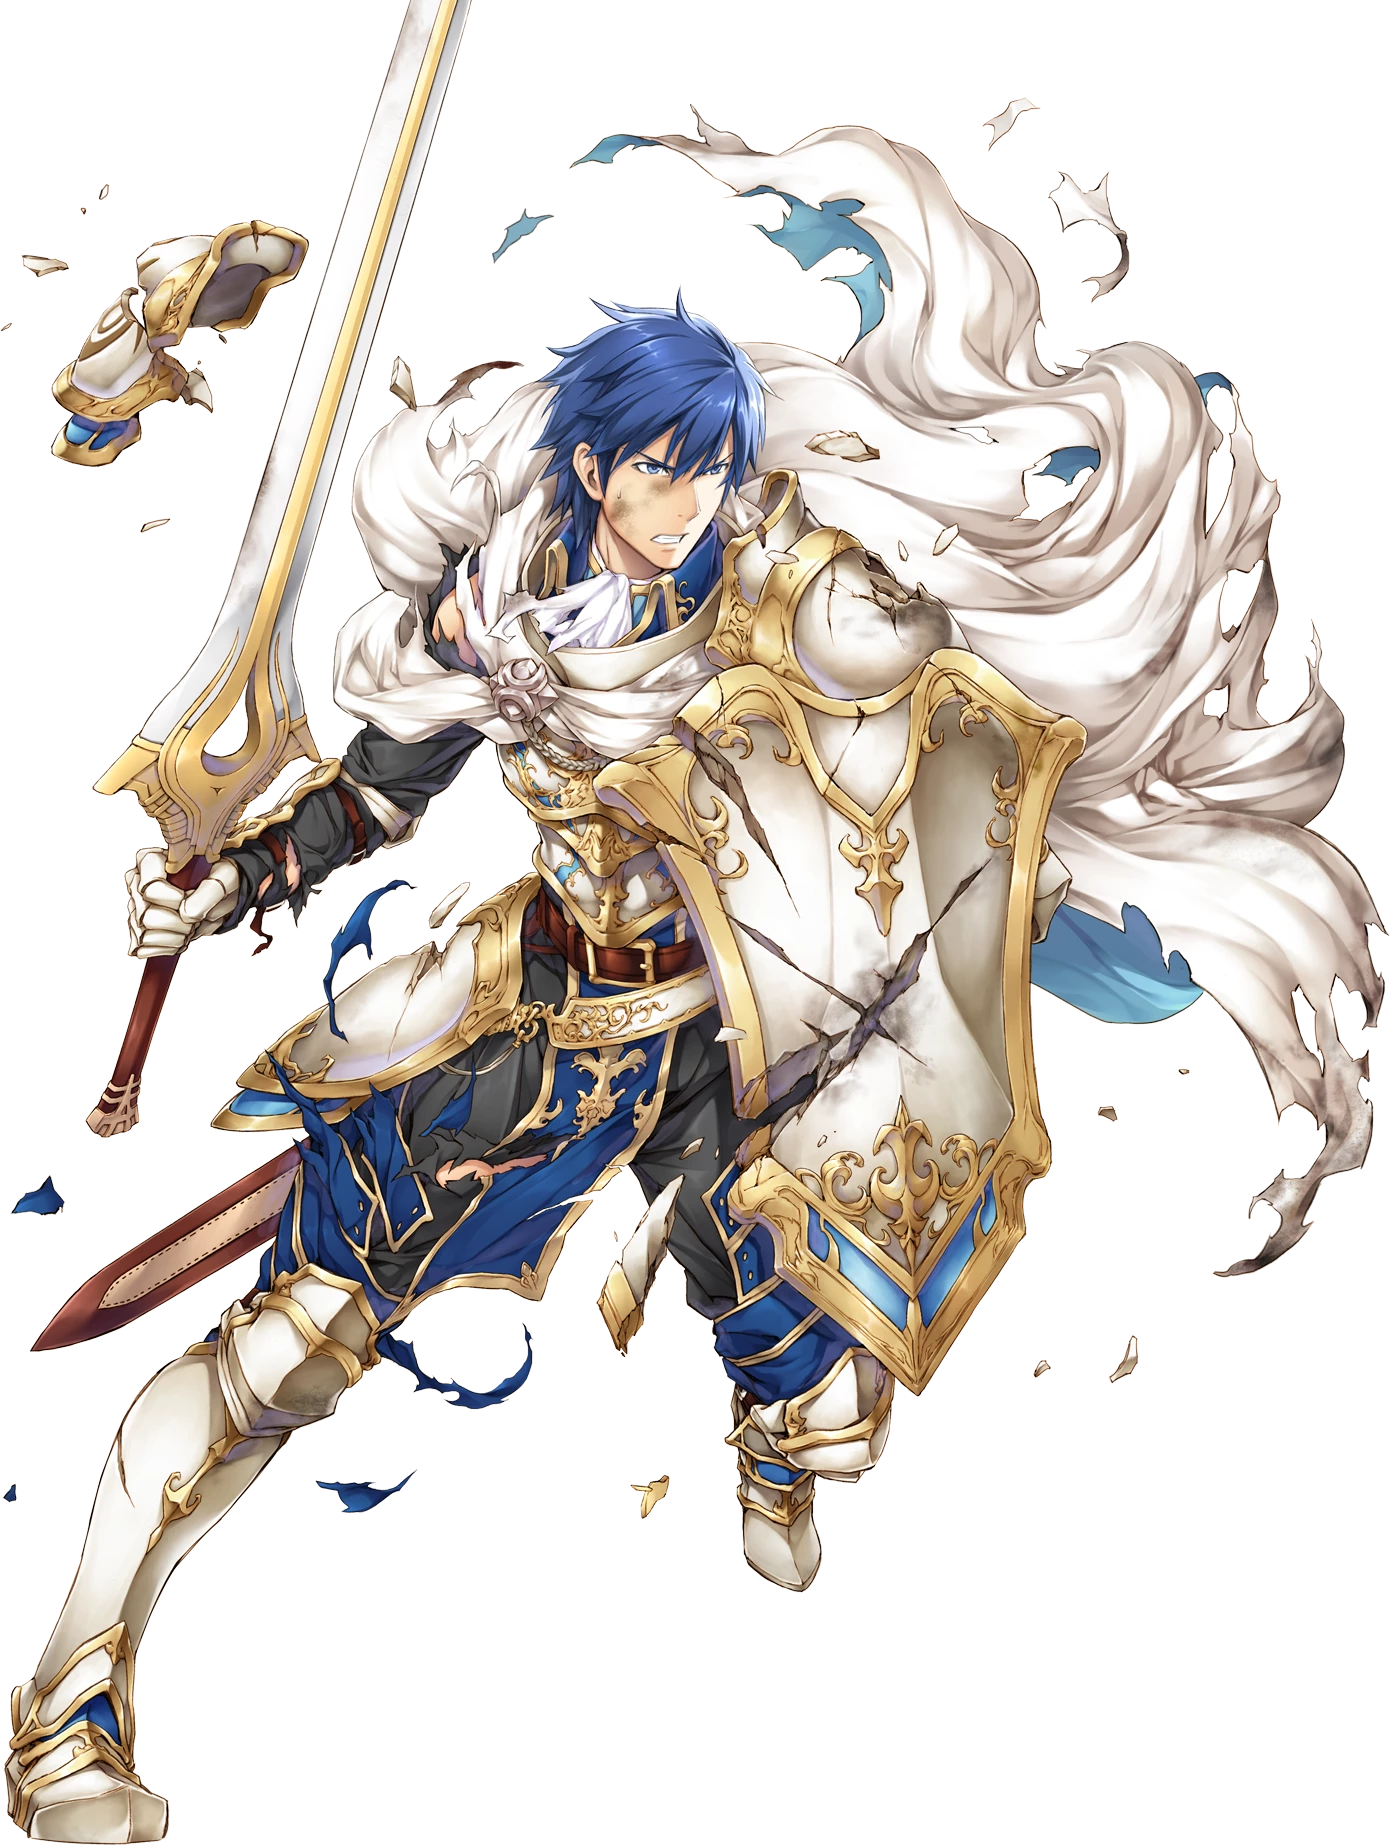 Cool shield Fire emblem, Fantasy character design